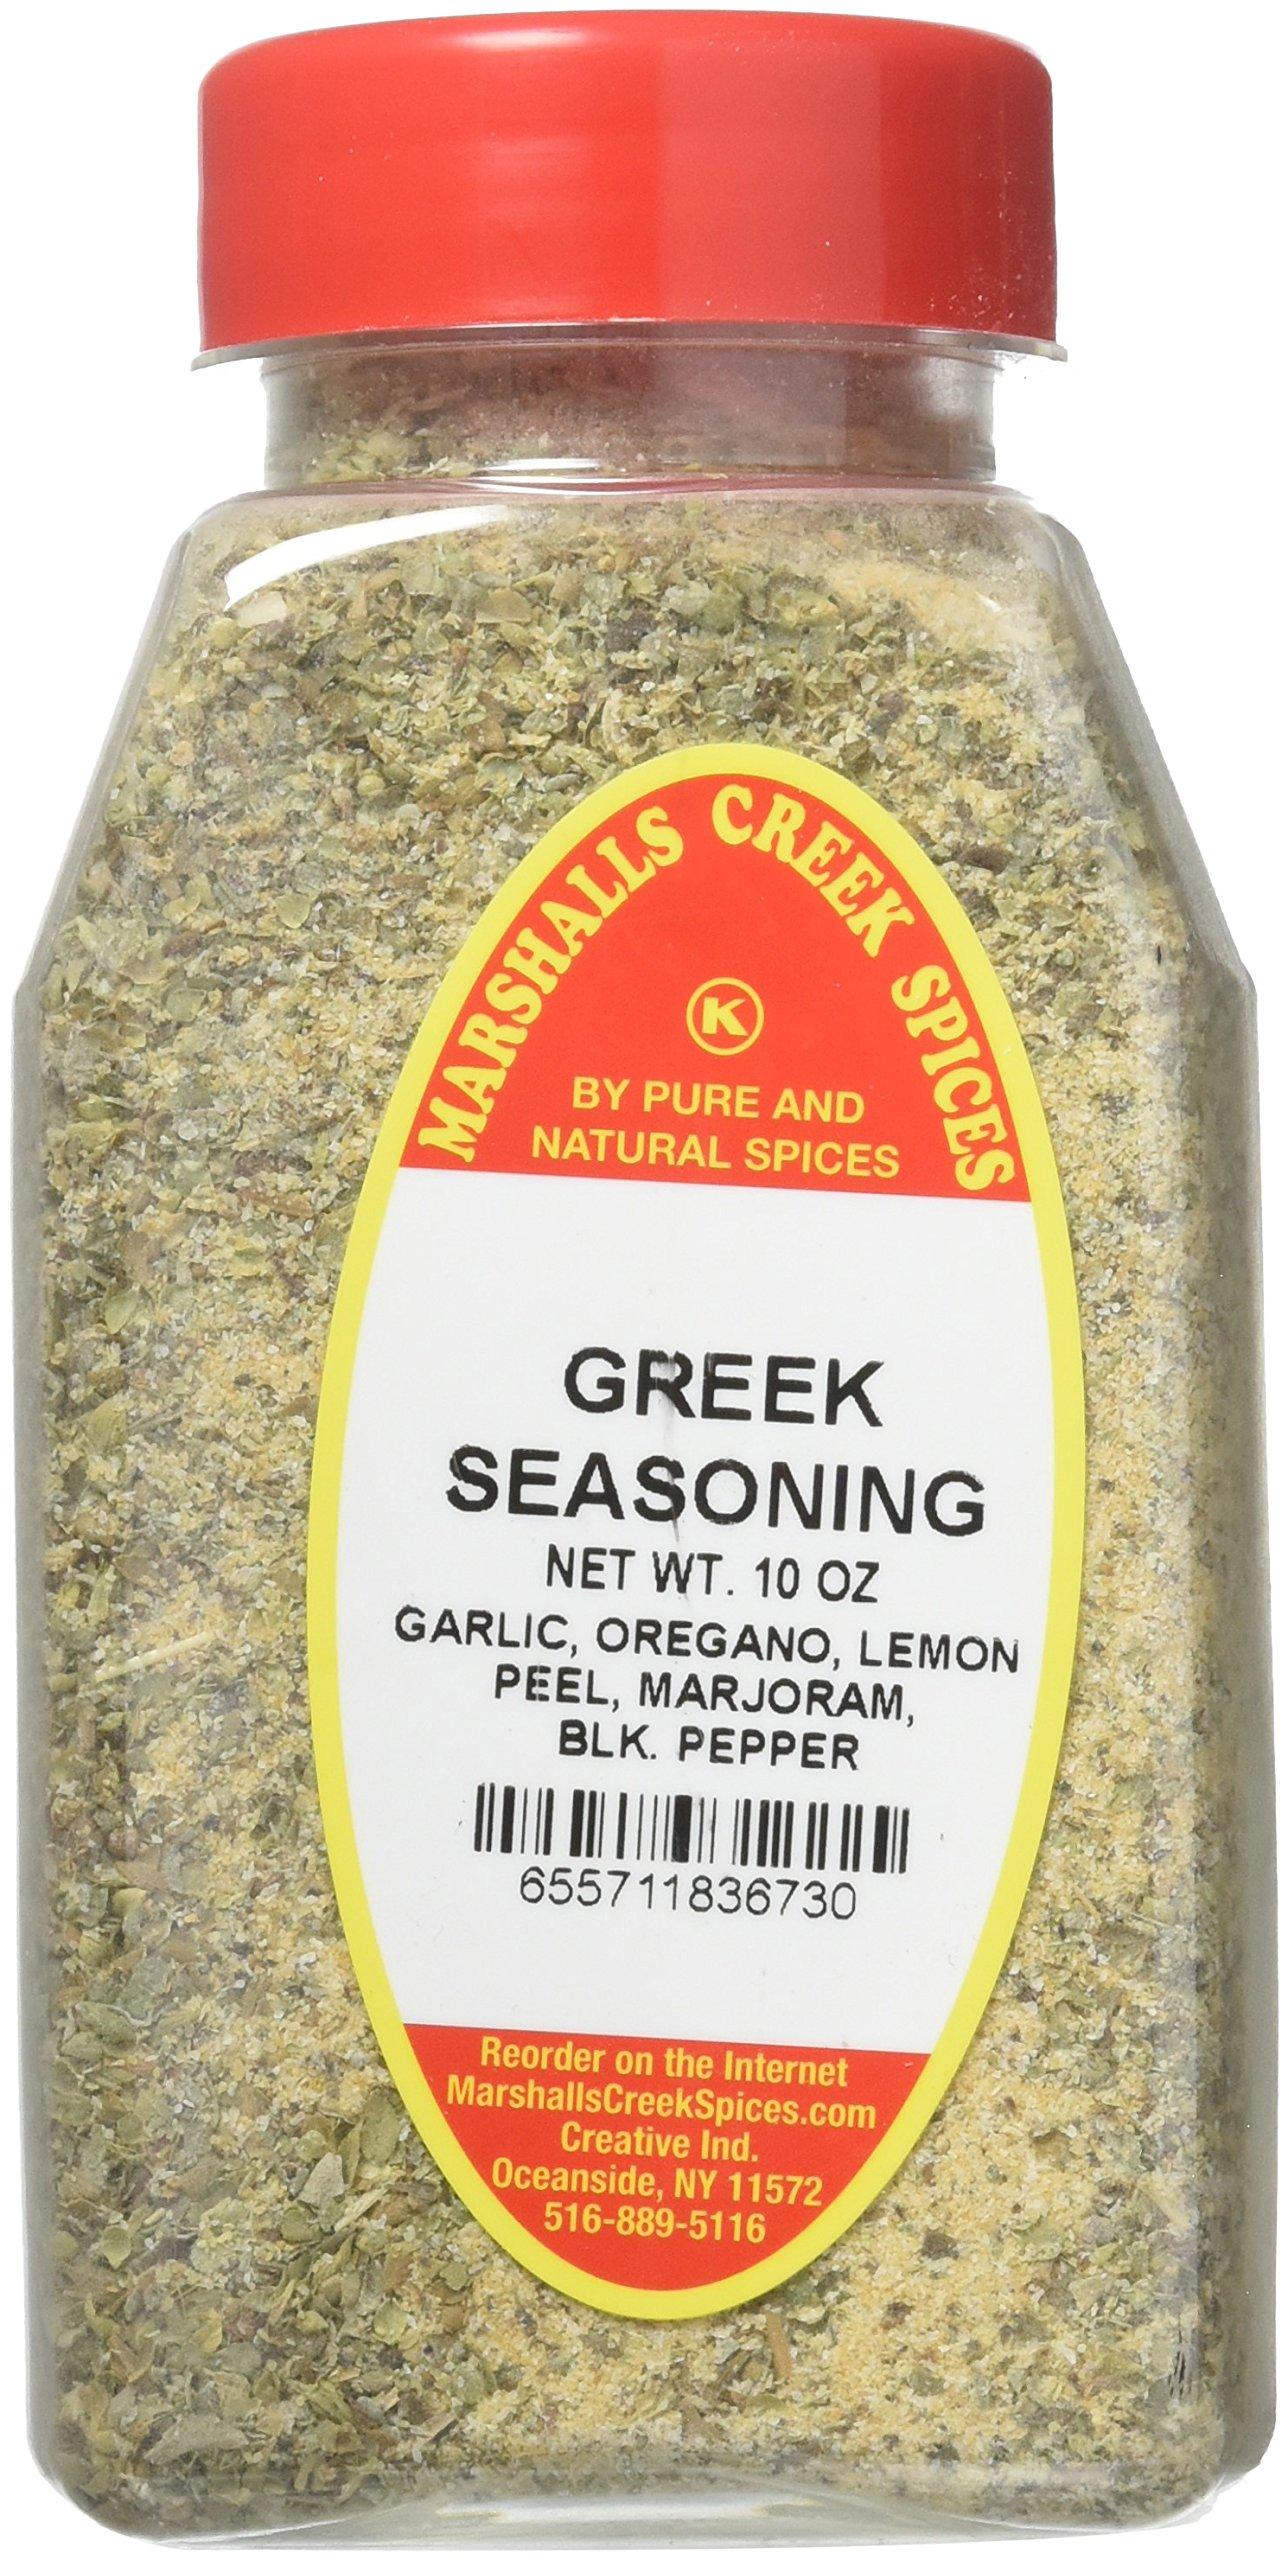 Marshalls Creek Spices Kosher No Salt, Greek Seasoning,, 10 Ounce